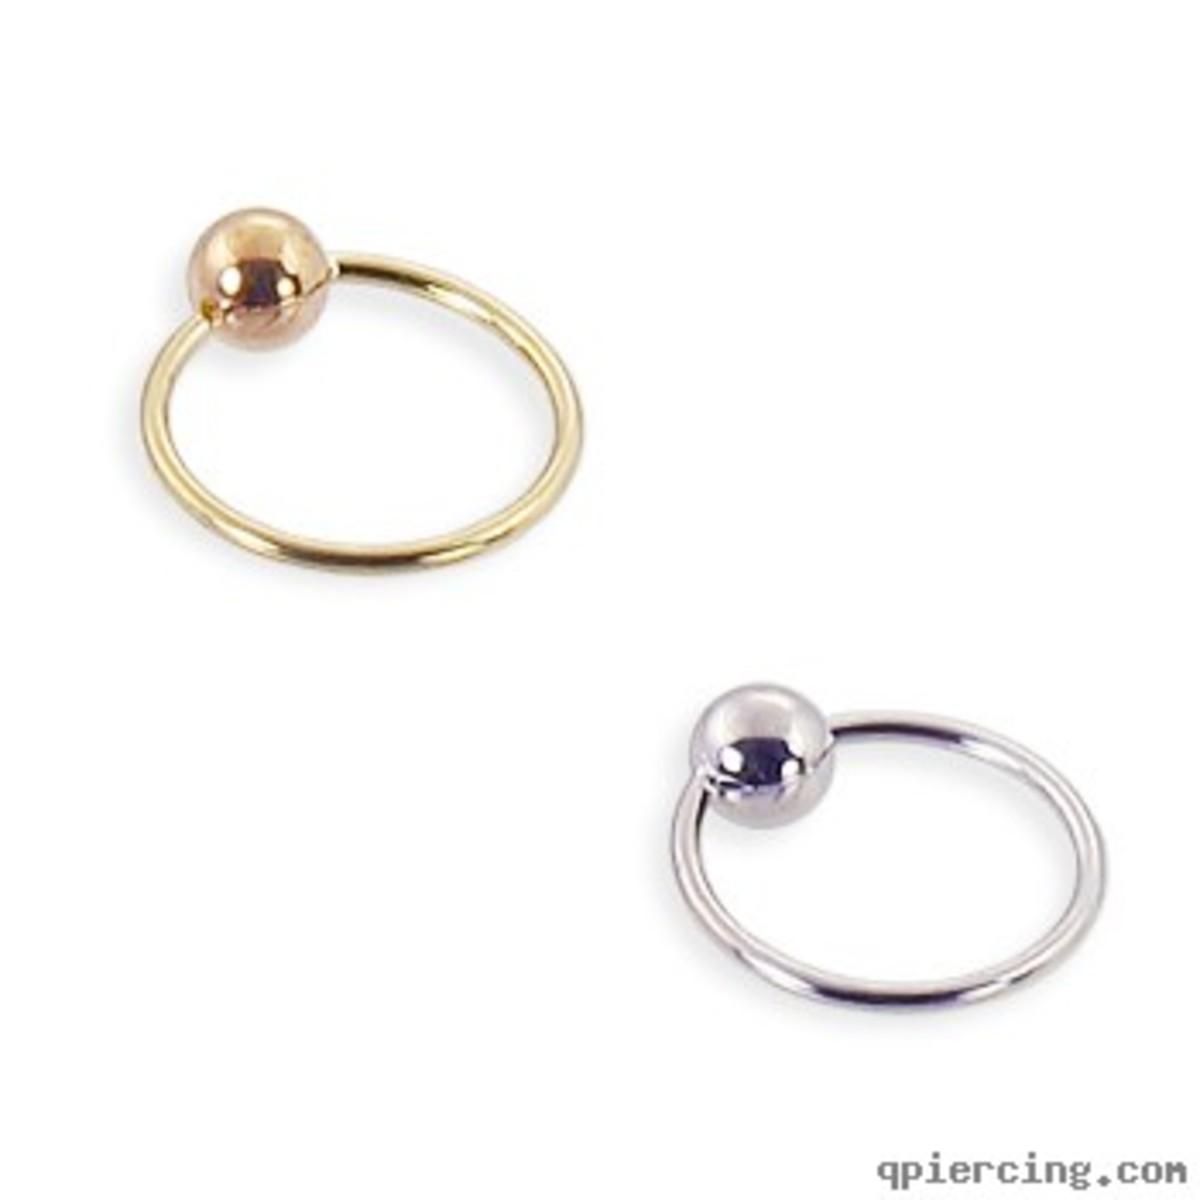 14K Gold Captive Bead Ring, 22 Ga